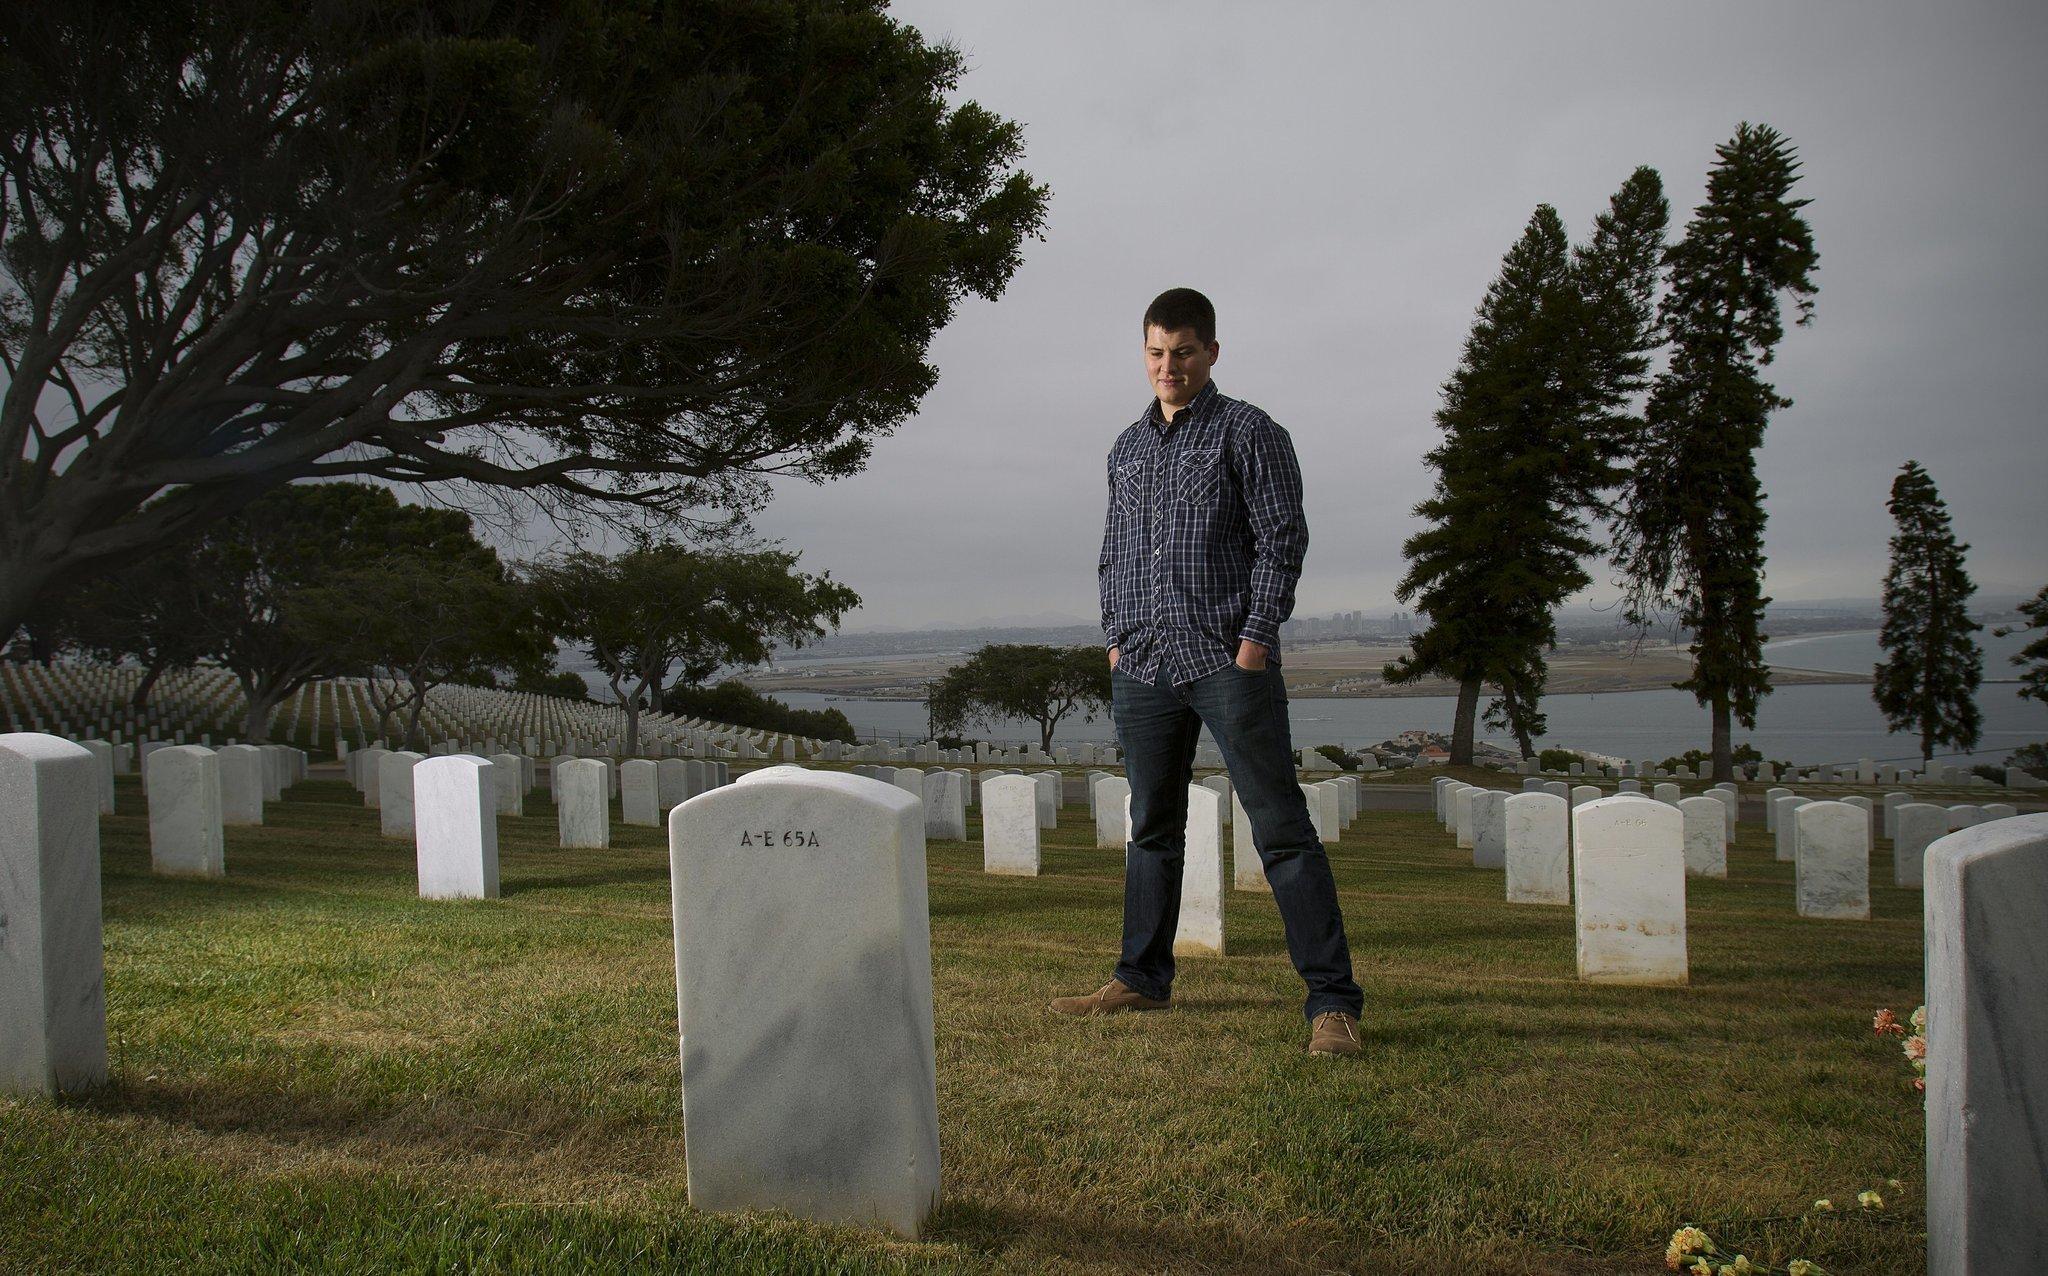 lone survivor essay Lone survivor (2013) on imdb: plot summary, synopsis, and more.